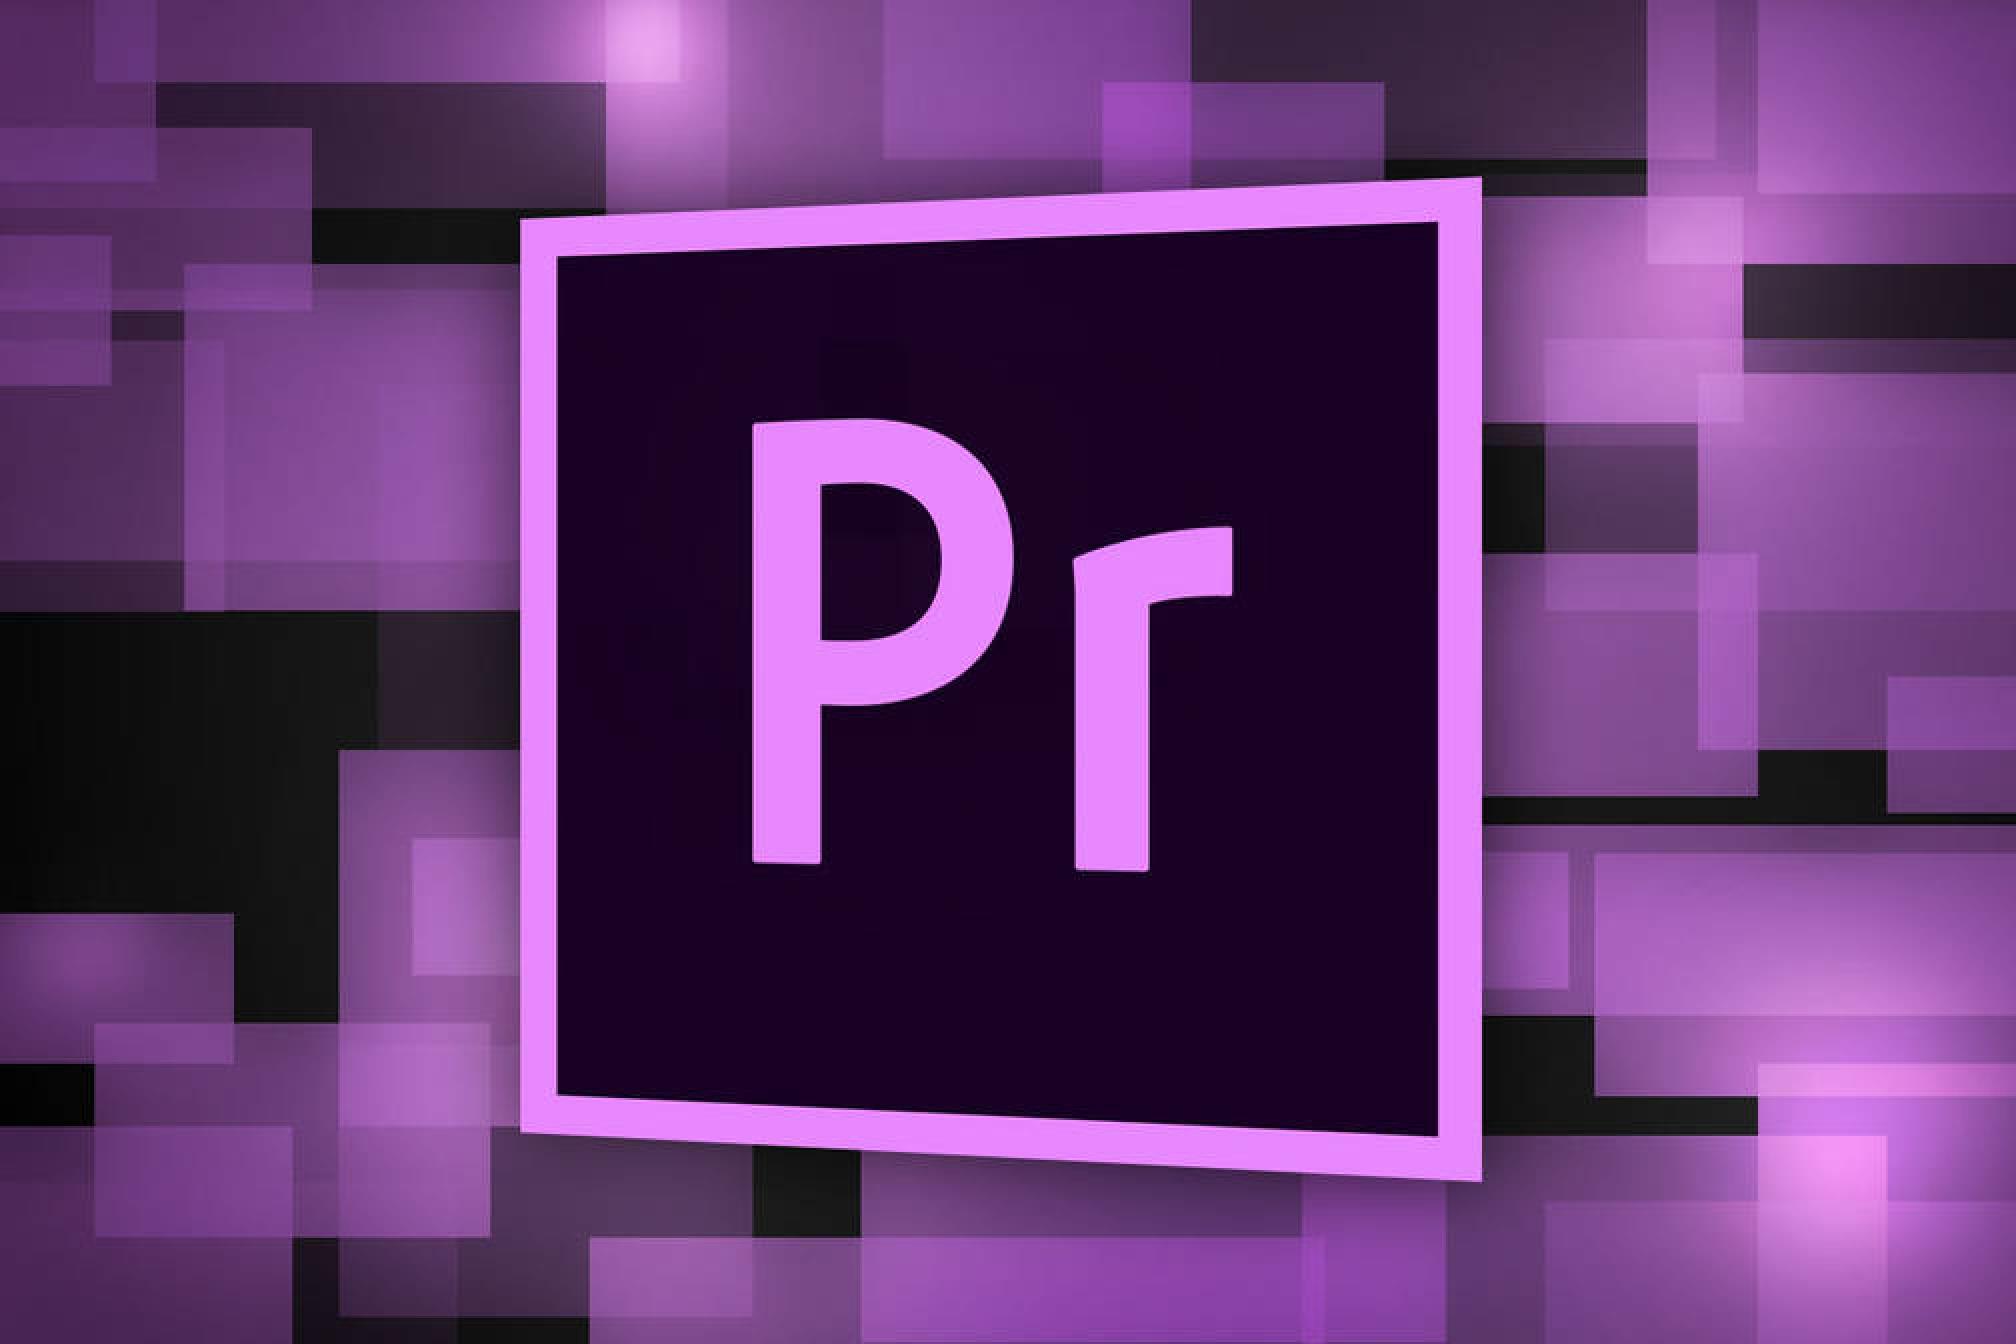 — OPTION B —Adobe Premiere Pro - ▾ REQUIRED CLASSES ▾Intro to Adobe Premiere Pro (12 hours)Advanced Adobe Premiere Pro (12 hours)